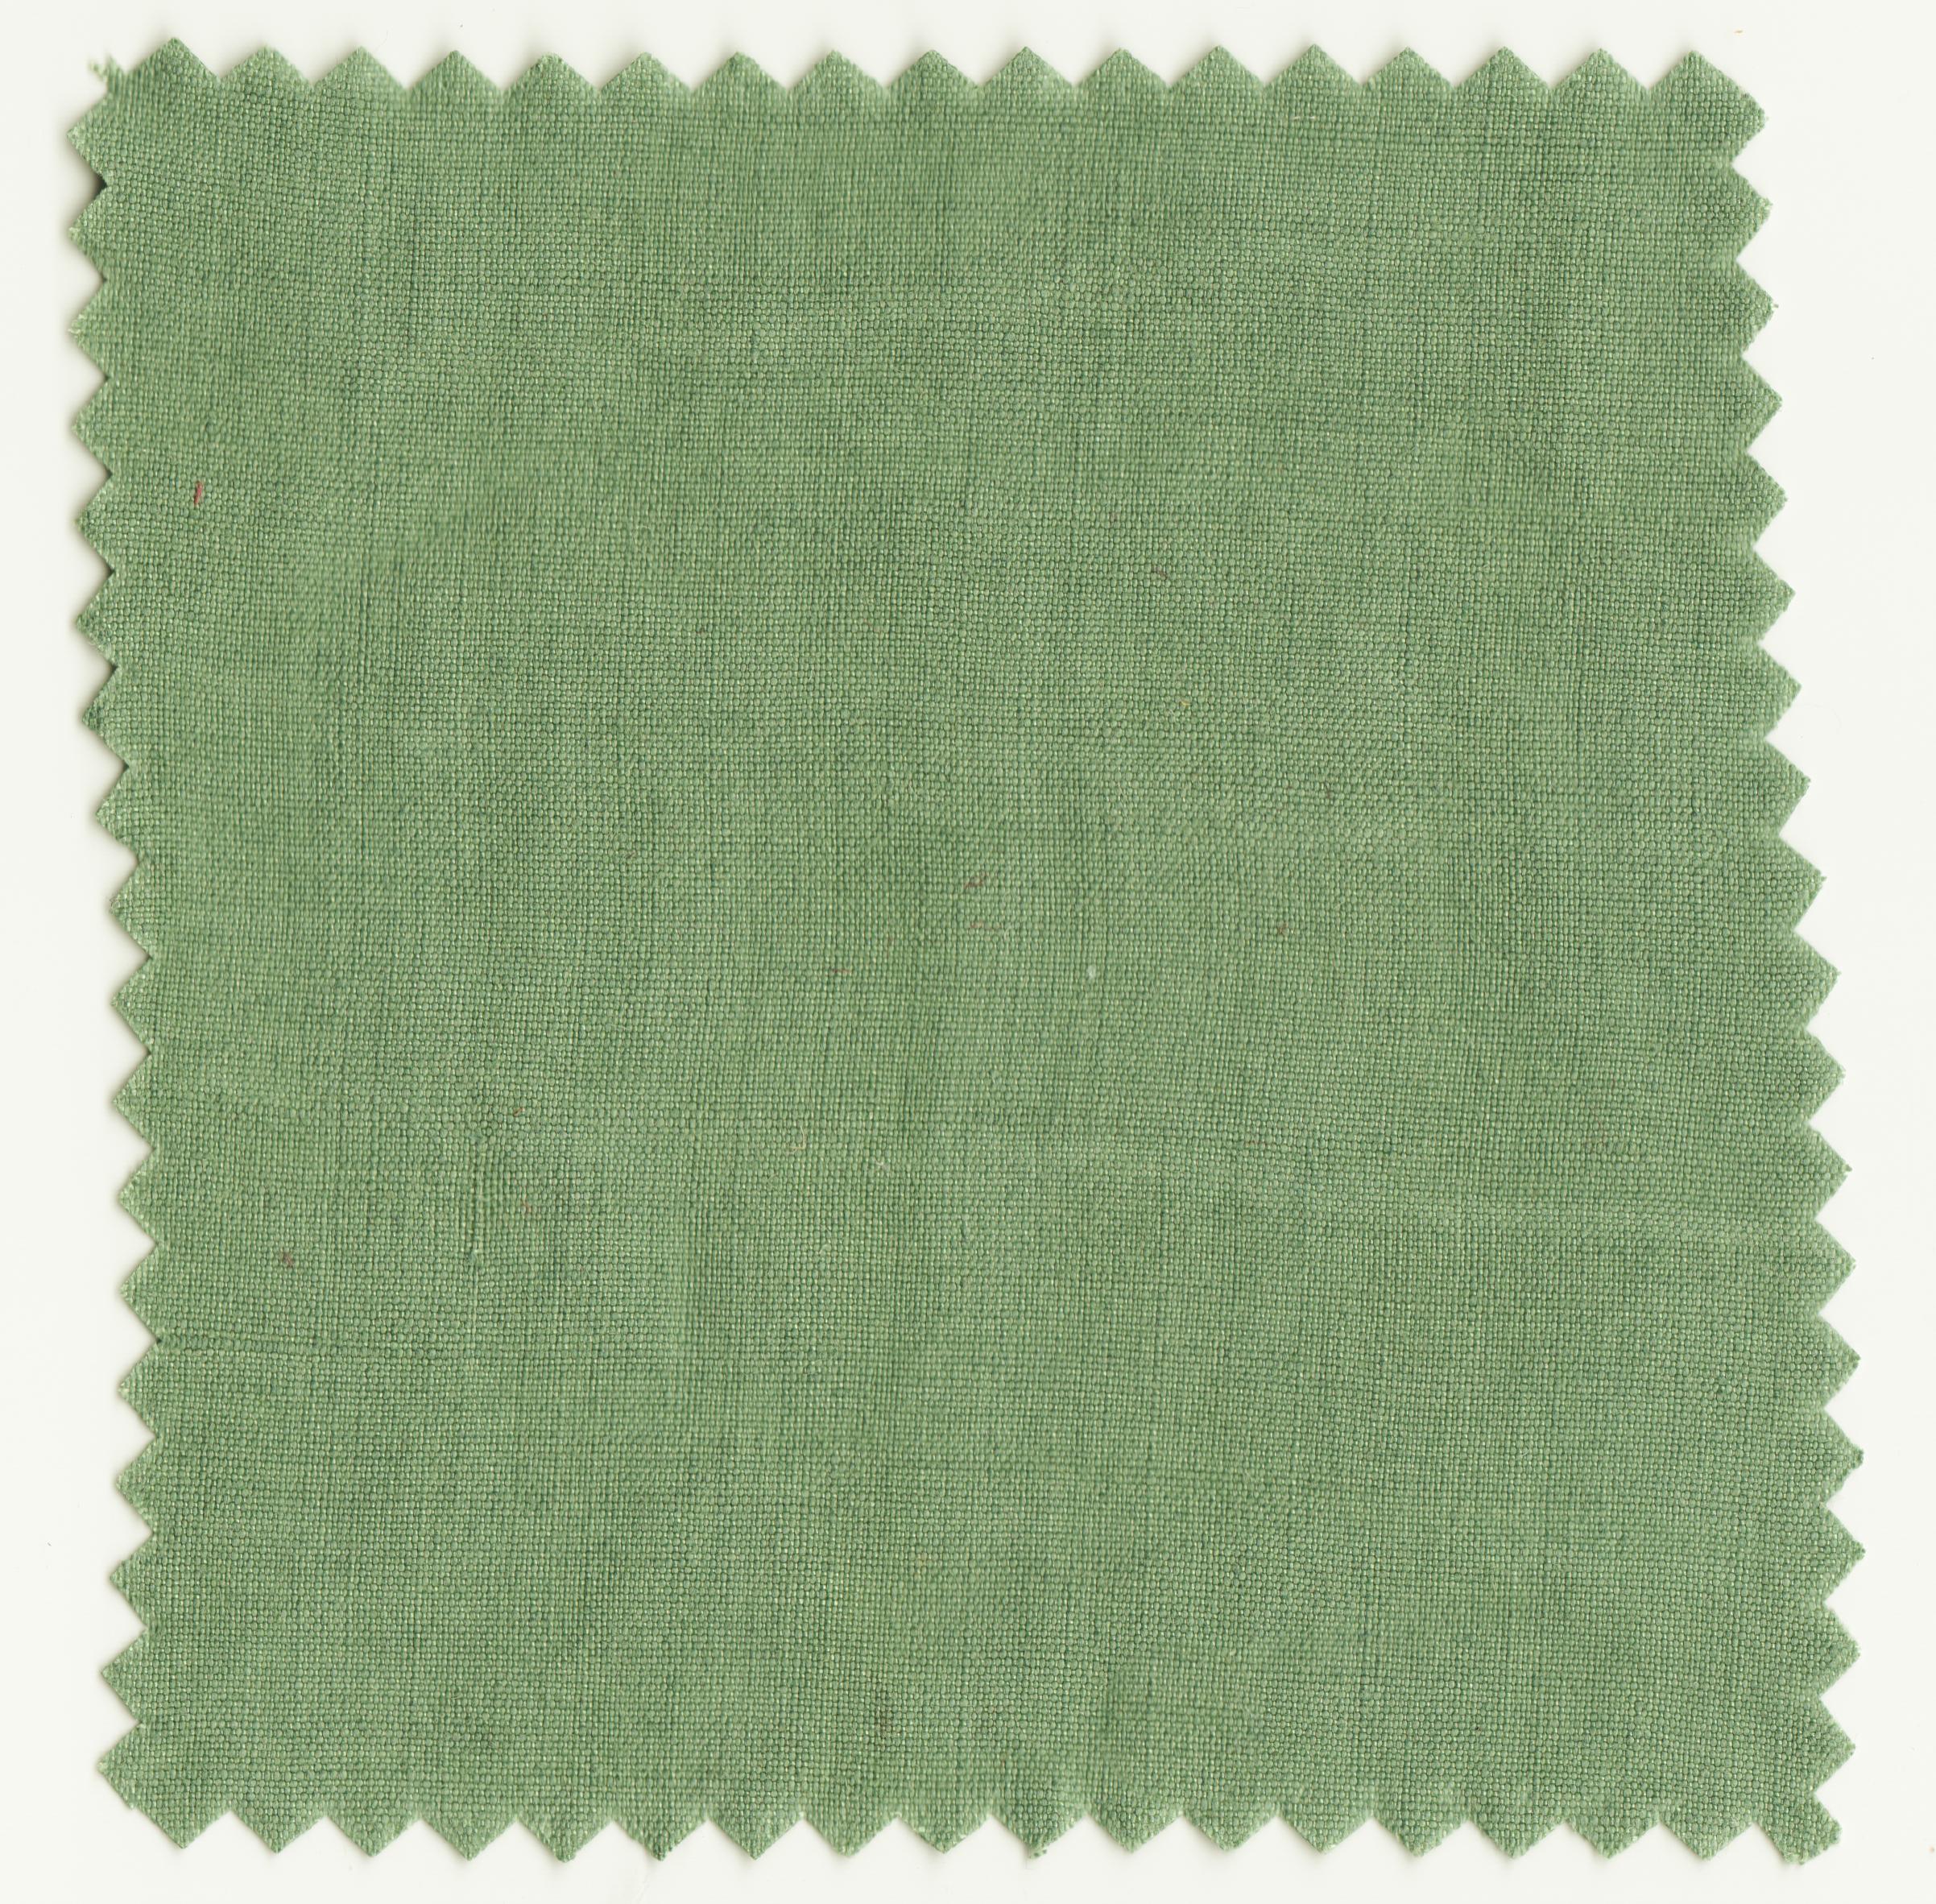 Celadon Greens-5.jpg